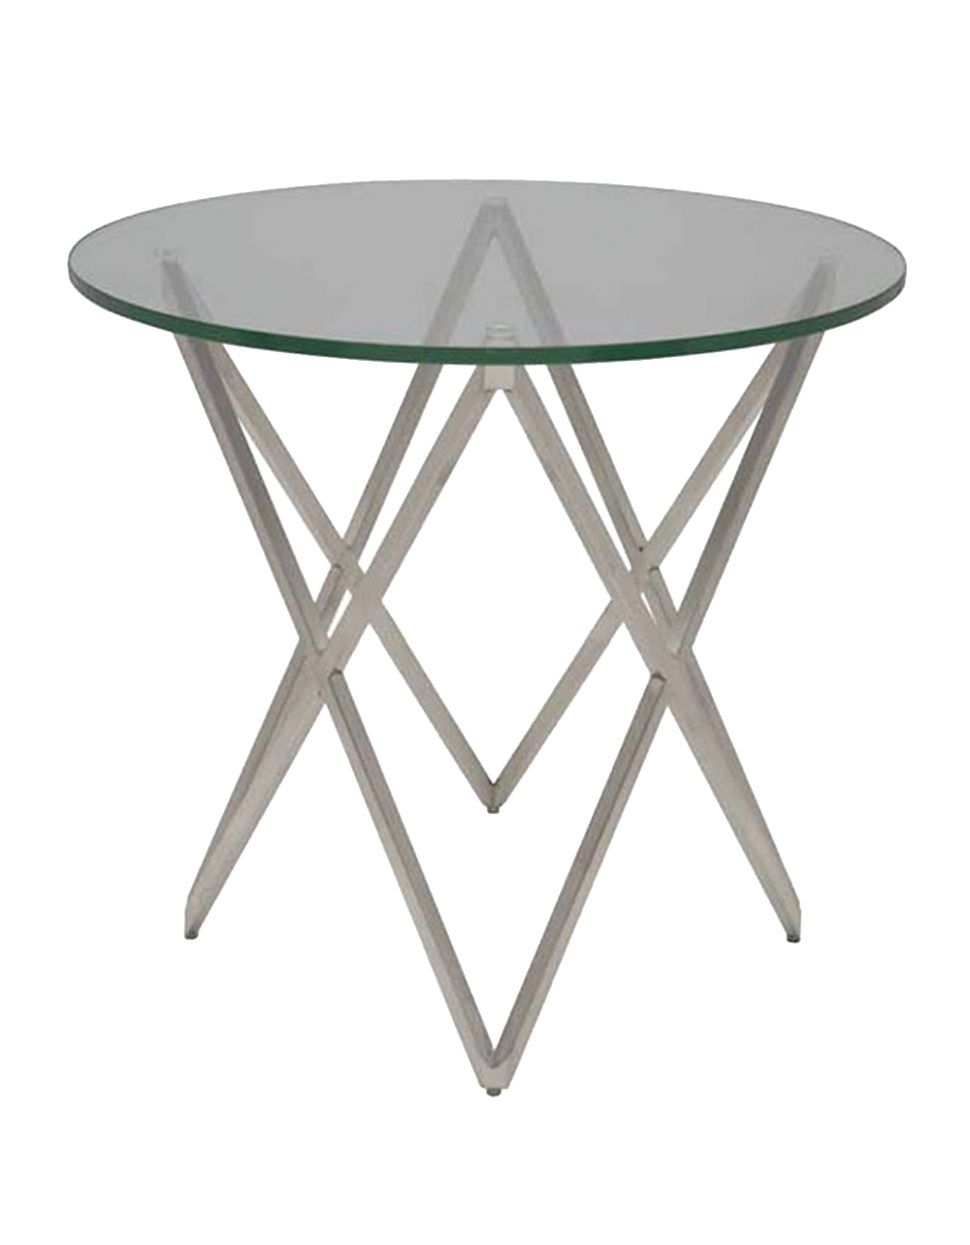 Modern glass end table  Home  Furniture  Lattice Side Table  Hudsonus Bay  Acrylic